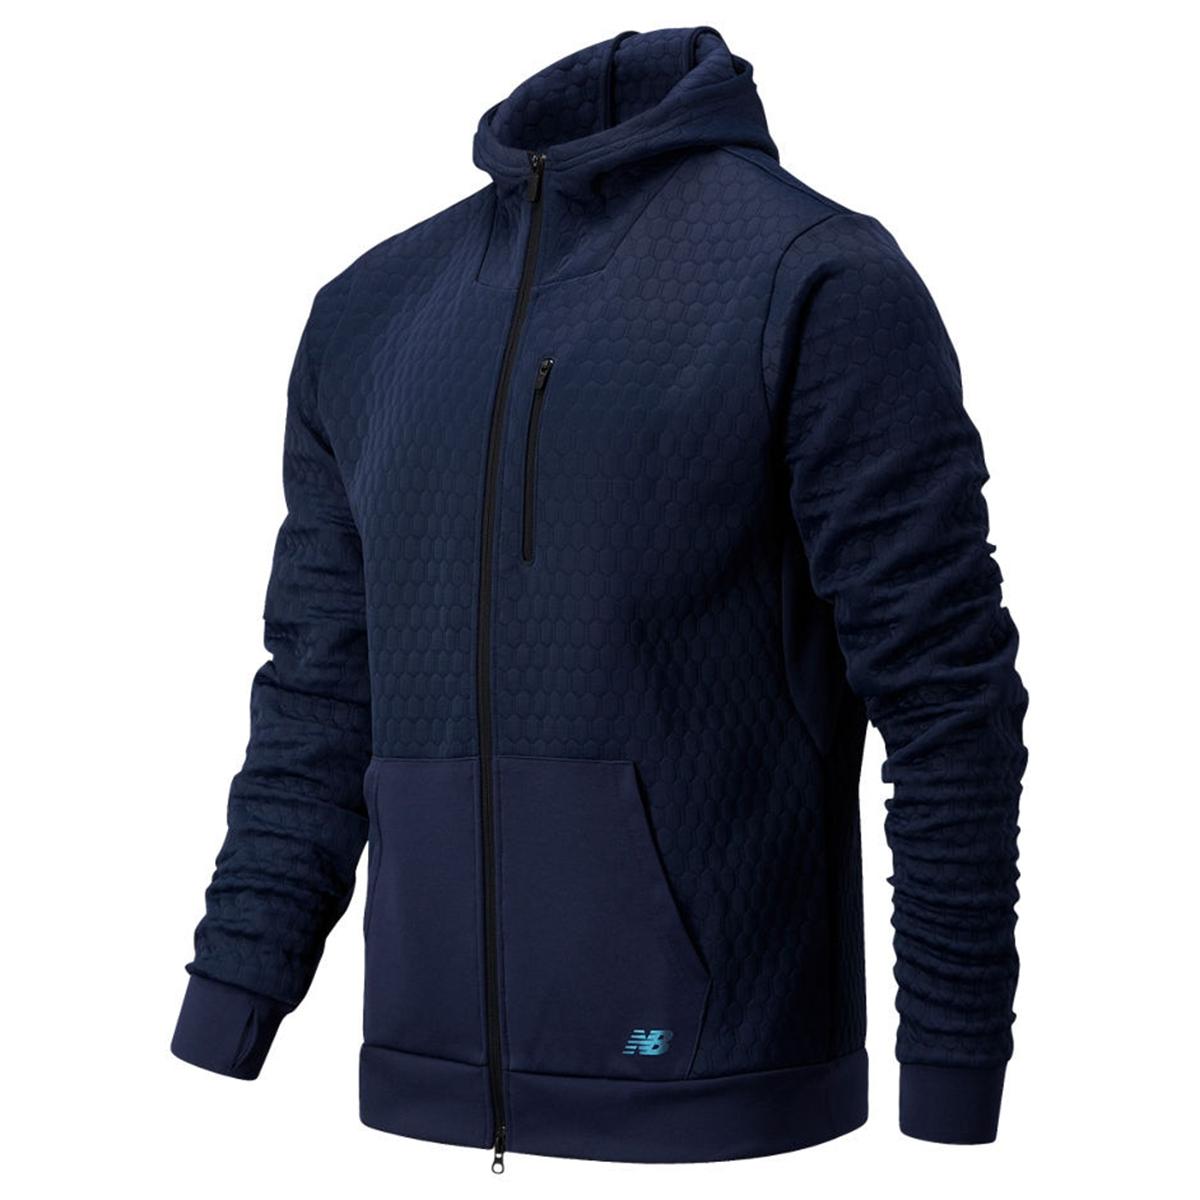 photo of the new balance heatloft full zip jacket in navy blue